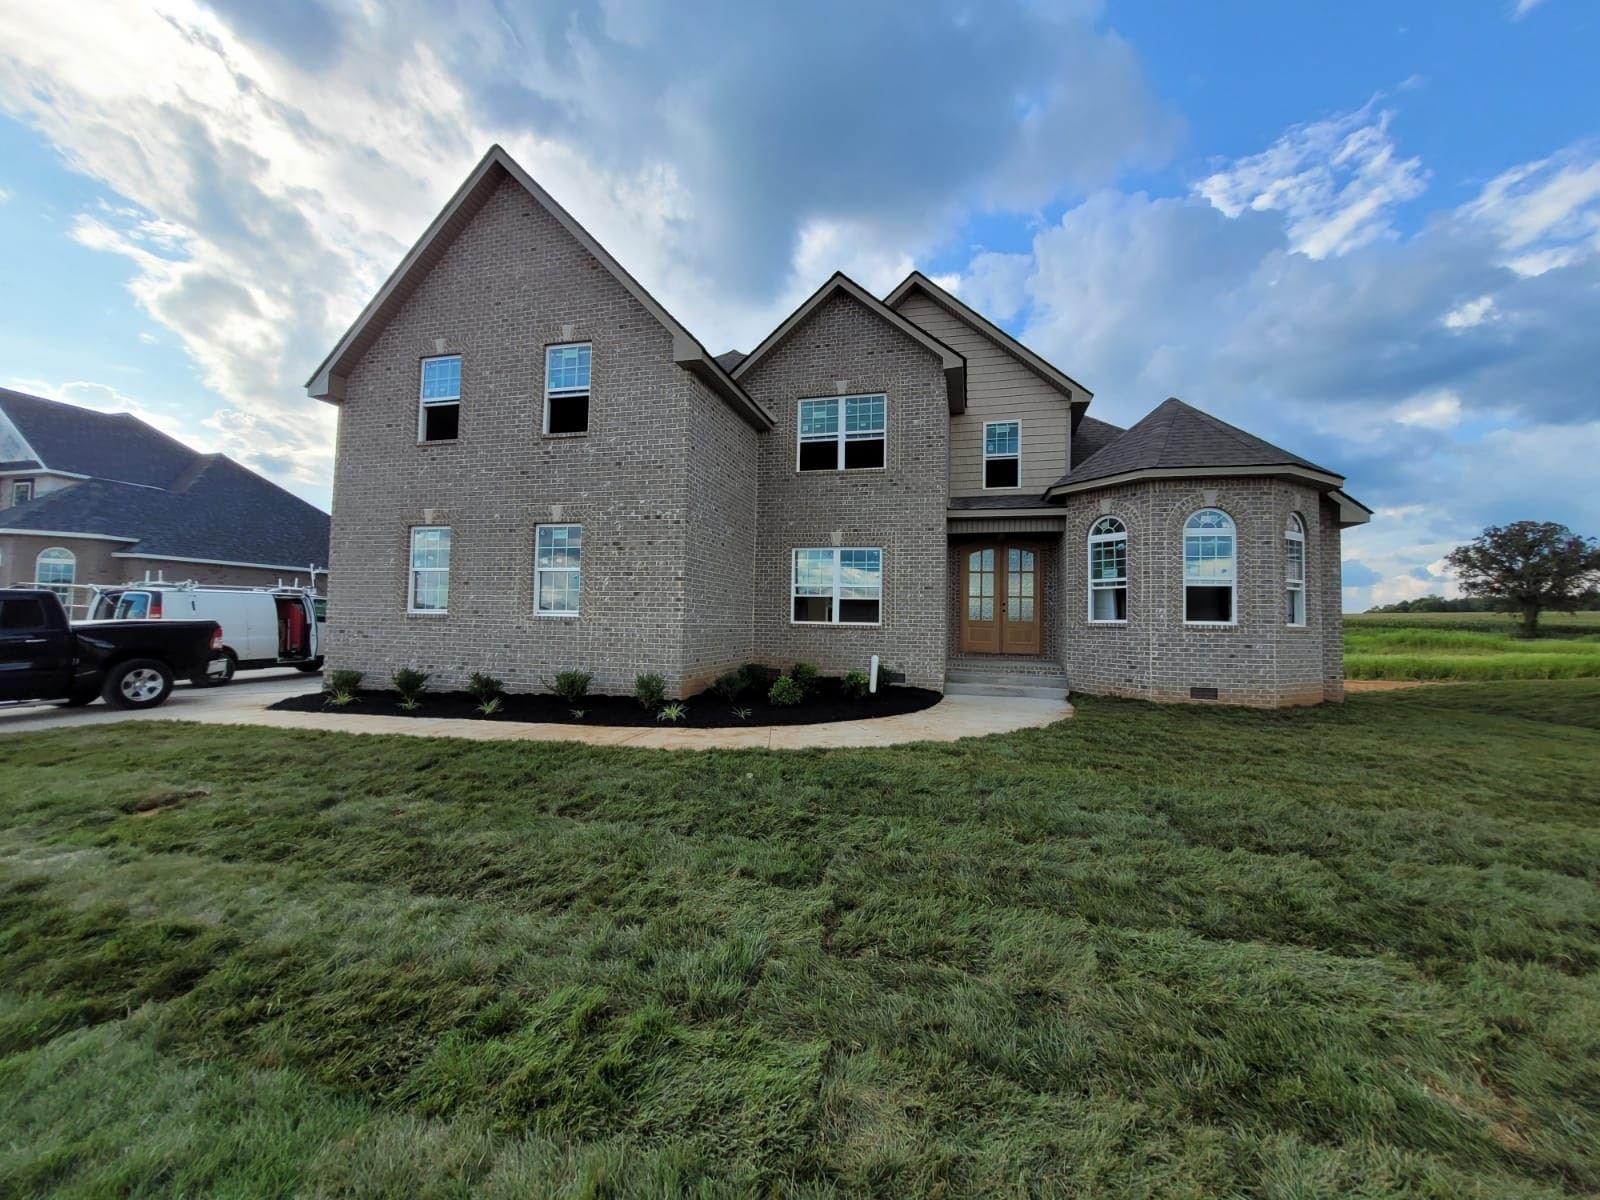 125 Hartley Hills, Clarksville, TN 37043 - MLS#: 2227420